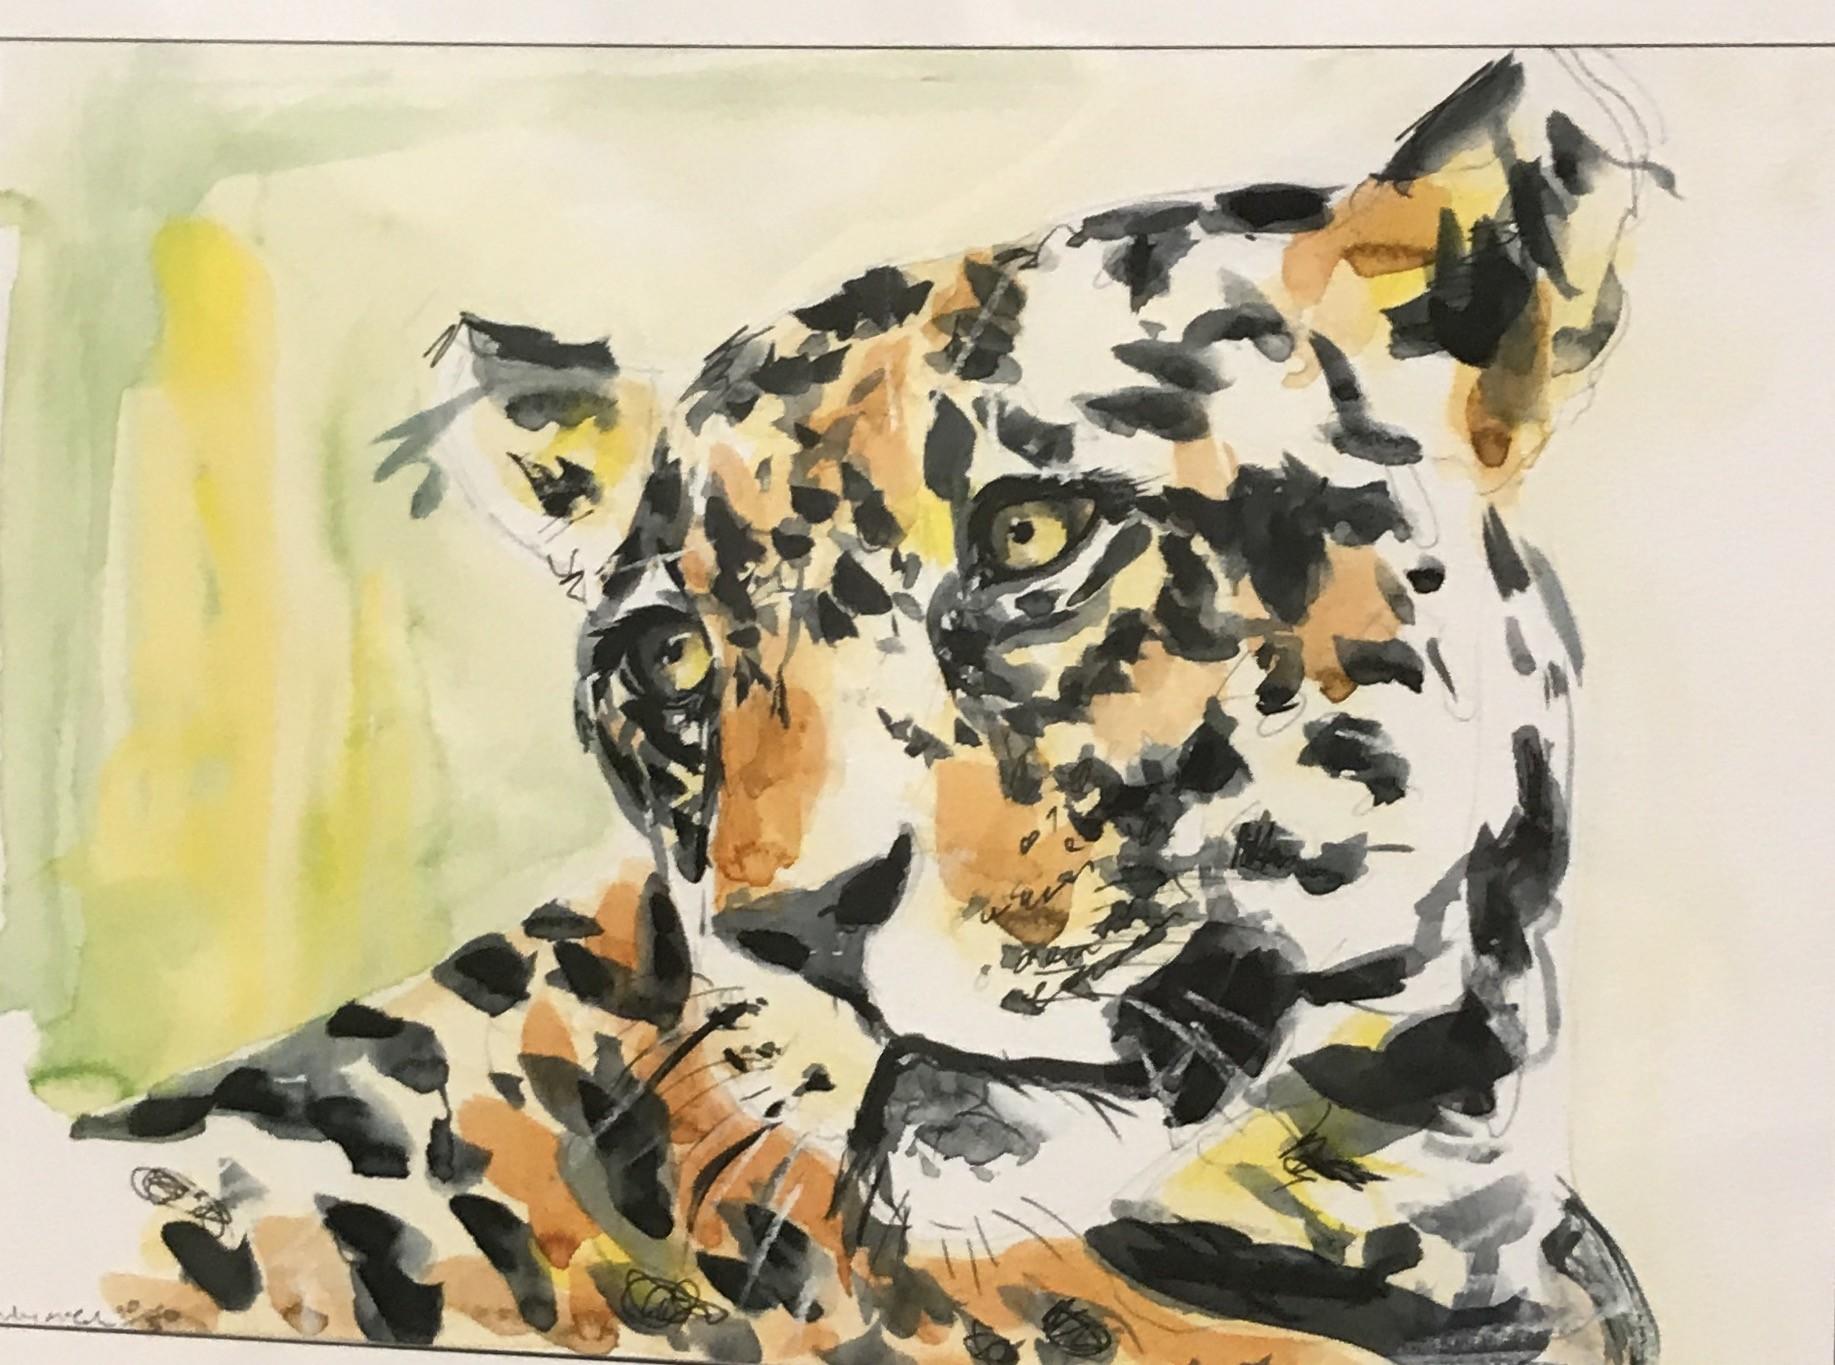 <span class=&#34;link fancybox-details-link&#34;><a href=&#34;/artists/39-millie-mccallum/works/588-millie-mccallum-leopard/&#34;>View Detail Page</a></span><div class=&#34;artist&#34;><strong>Millie McCallum</strong></div> <div class=&#34;title&#34;><em>Leopard</em></div> <div class=&#34;medium&#34;>Watercolour Print (framed)</div> <div class=&#34;dimensions&#34;>28 x 20 cm</div> <div class=&#34;edition_details&#34;>30/50</div><div class=&#34;price&#34;>£95.00</div>